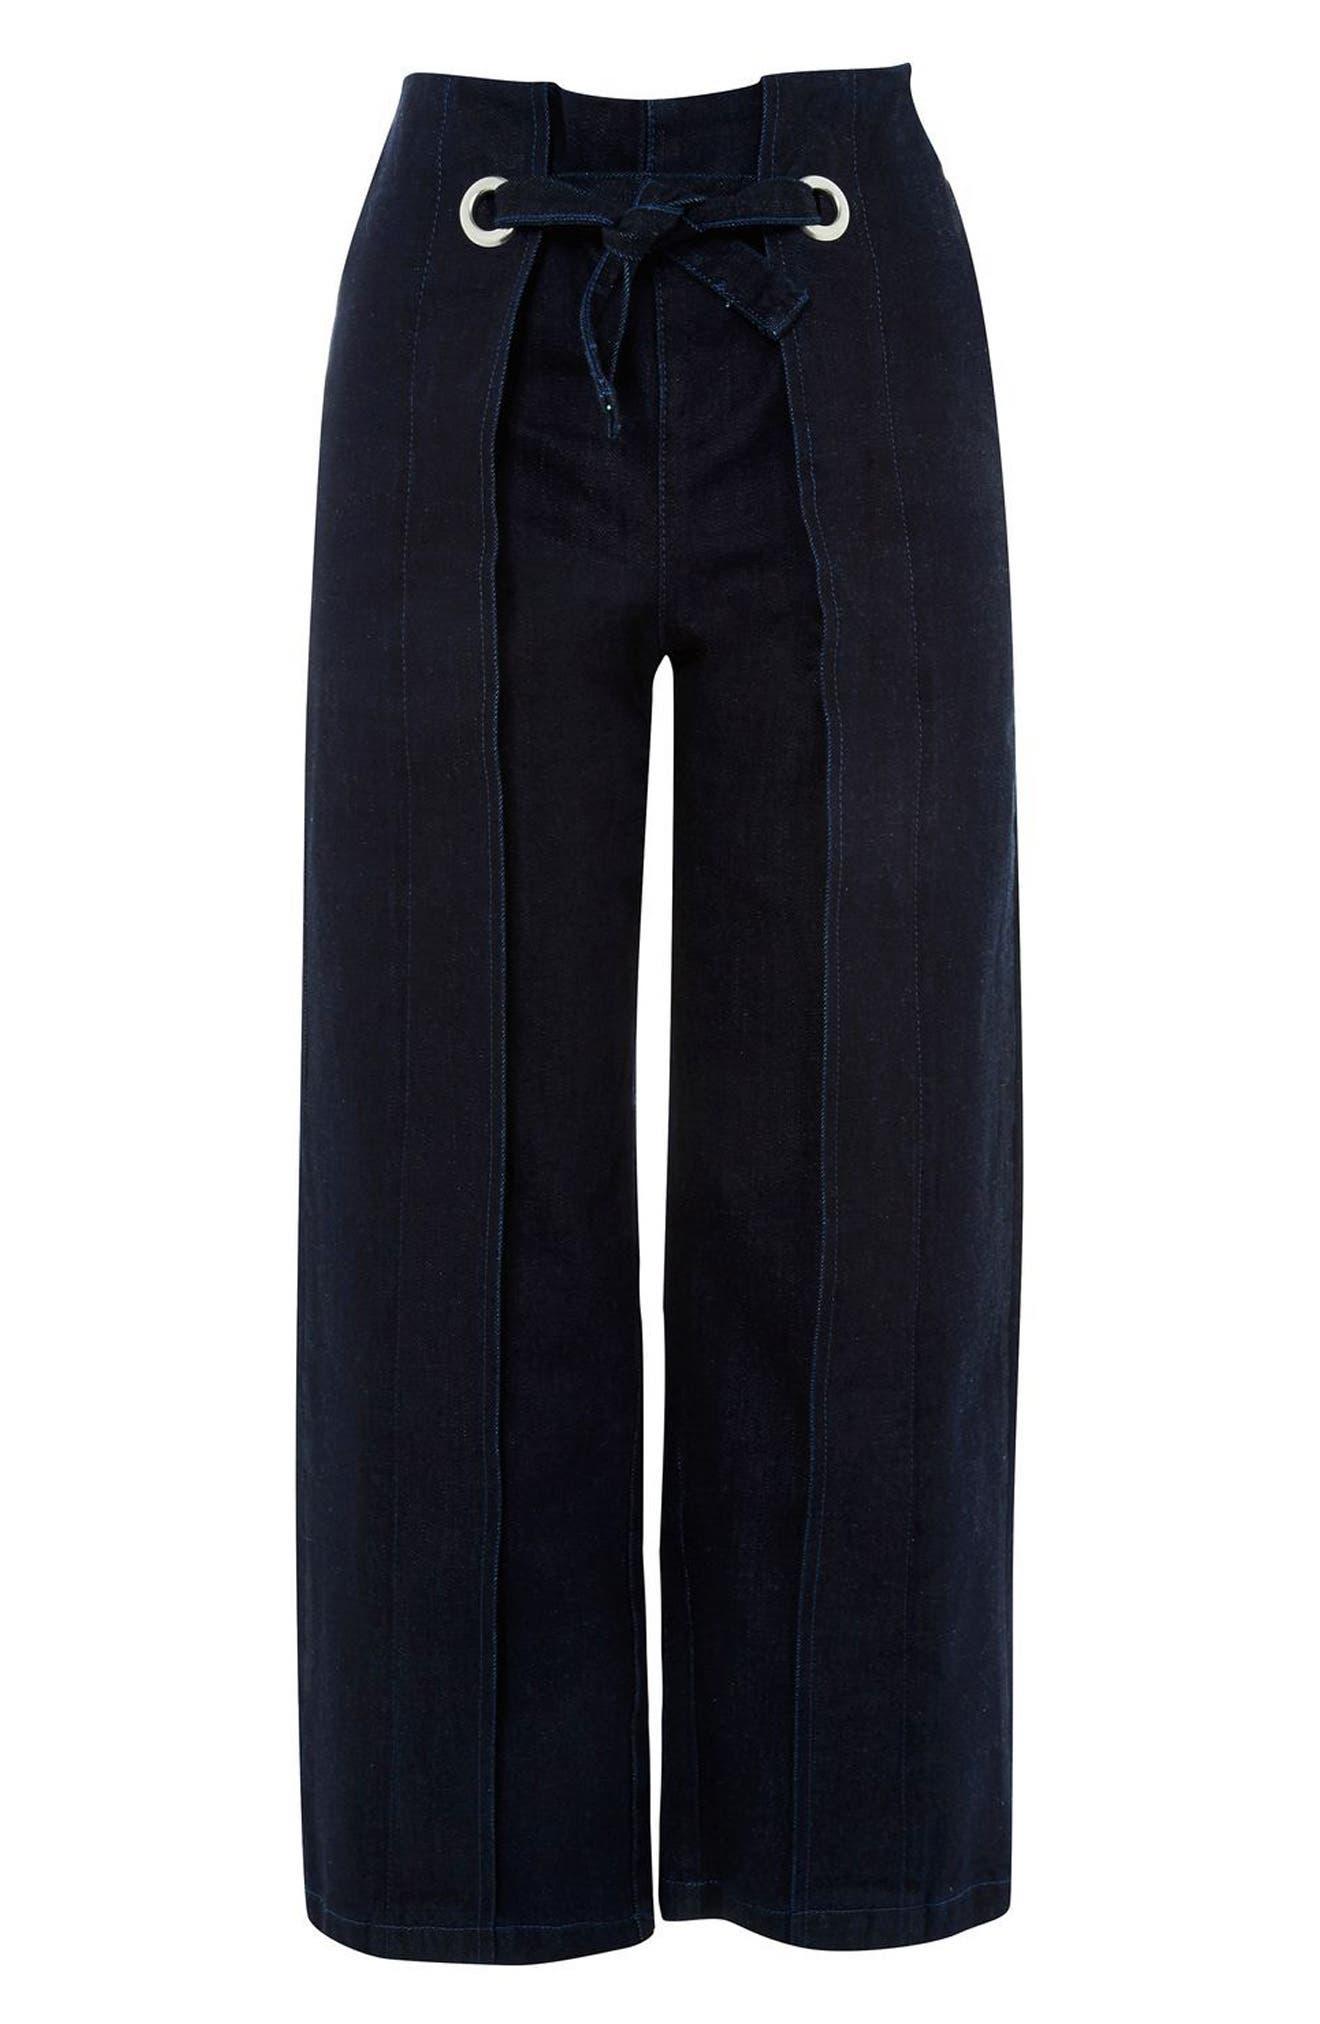 Topshop Tie Front Wide Leg Crop Jeans